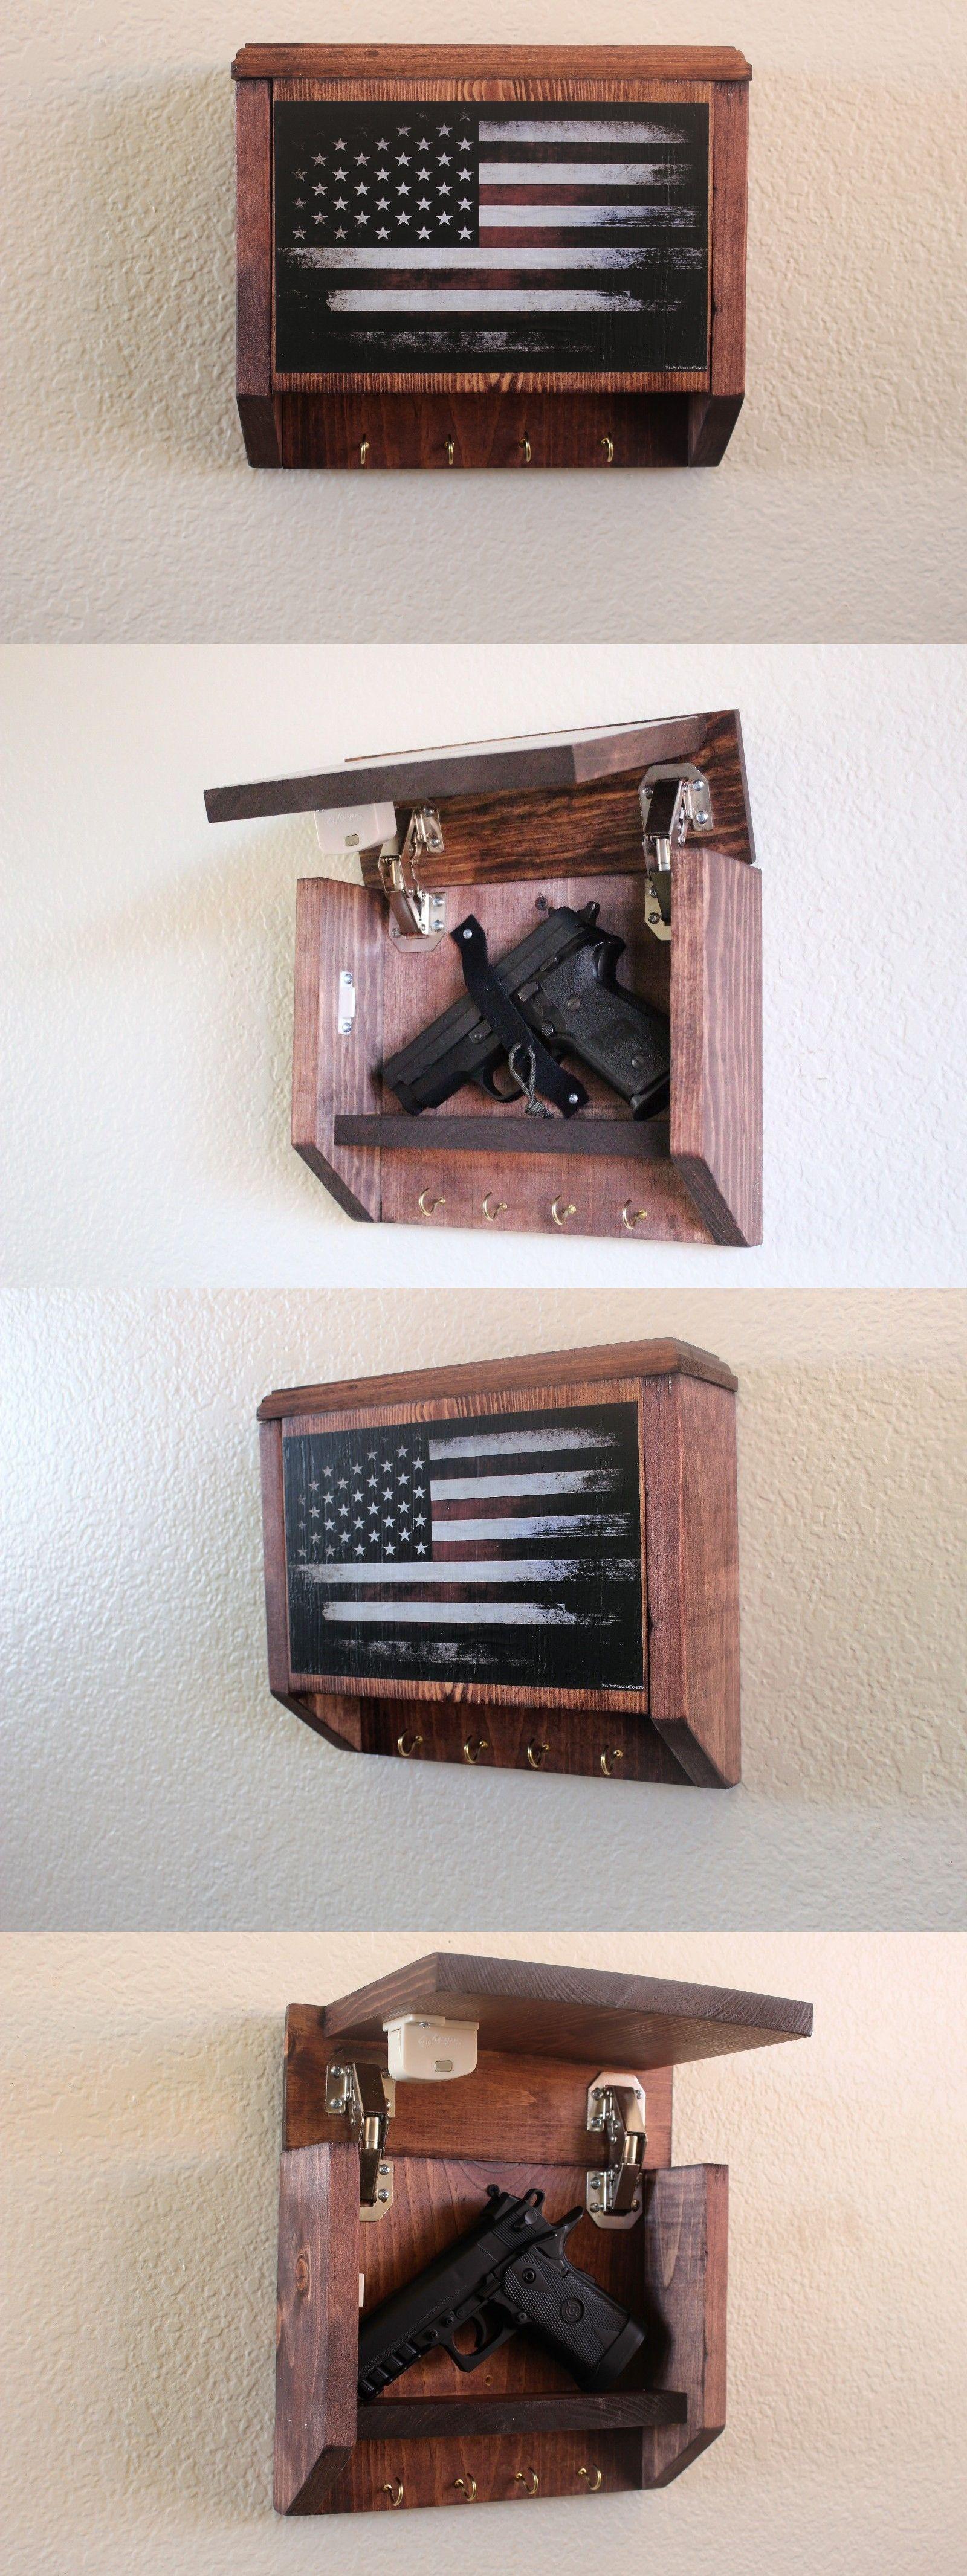 and Safes 177877 Hidden Gun Storage Key Rack